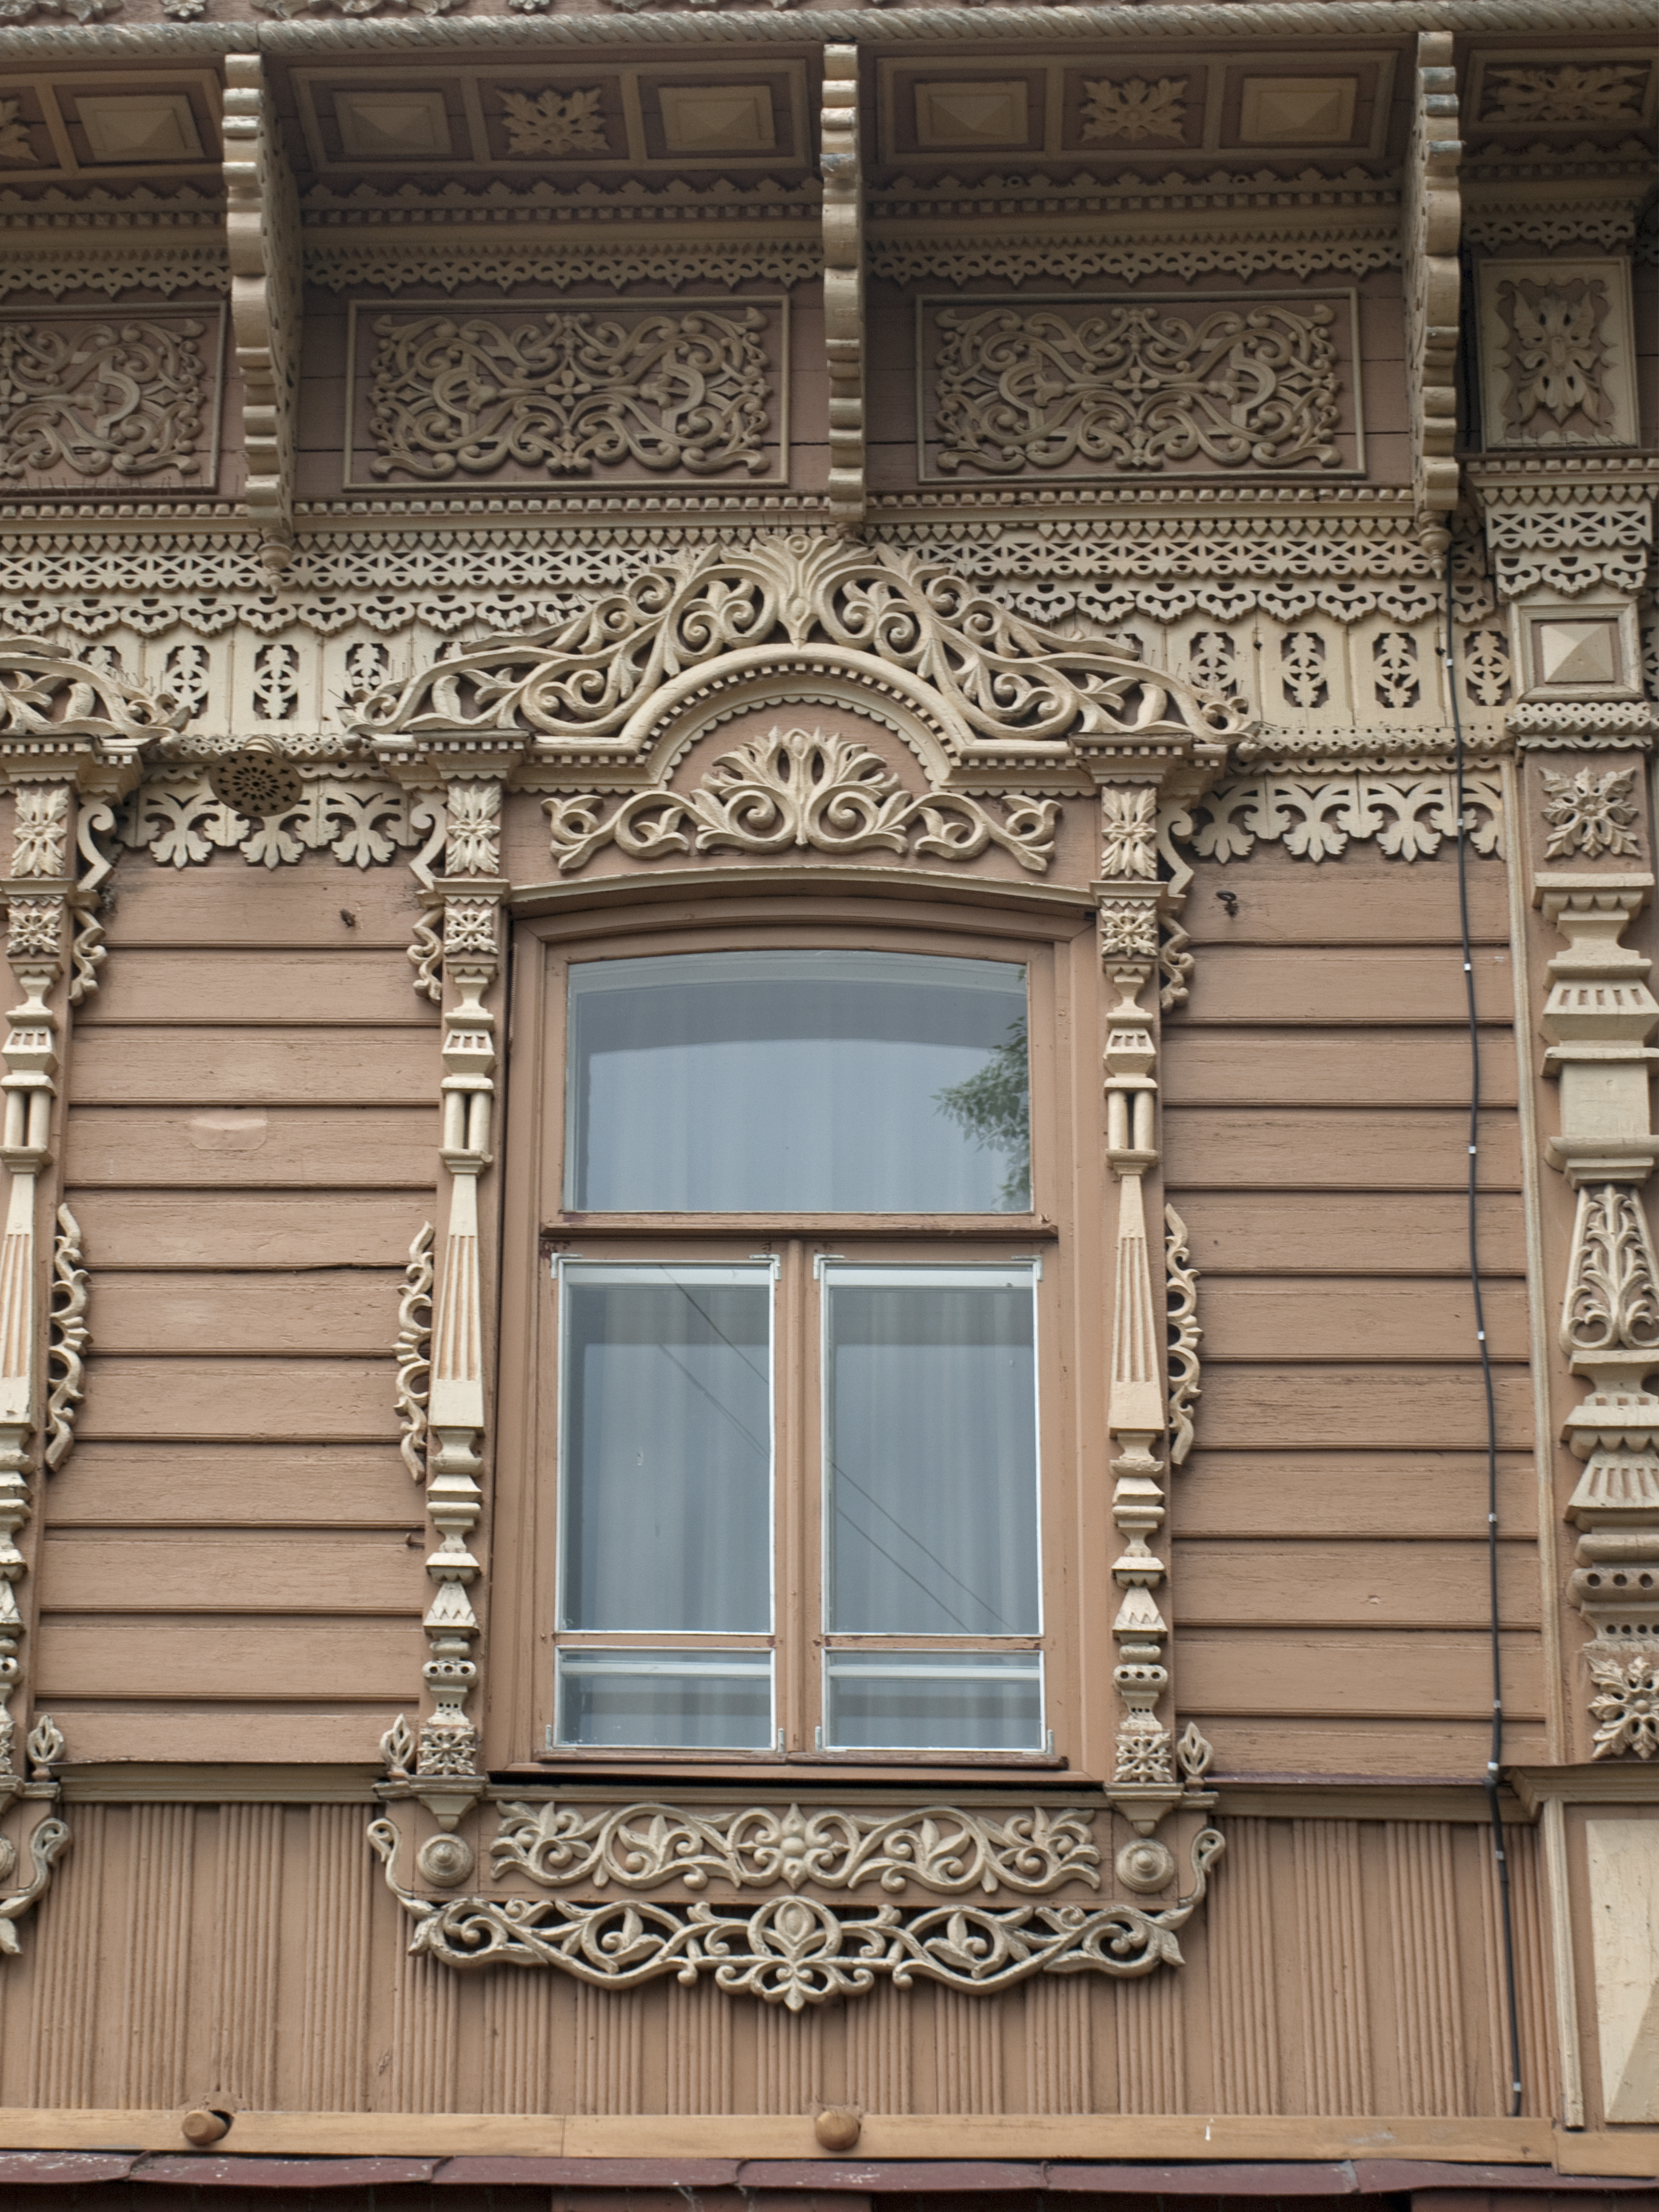 House window images - File Shishkov House Window Carving Jpg